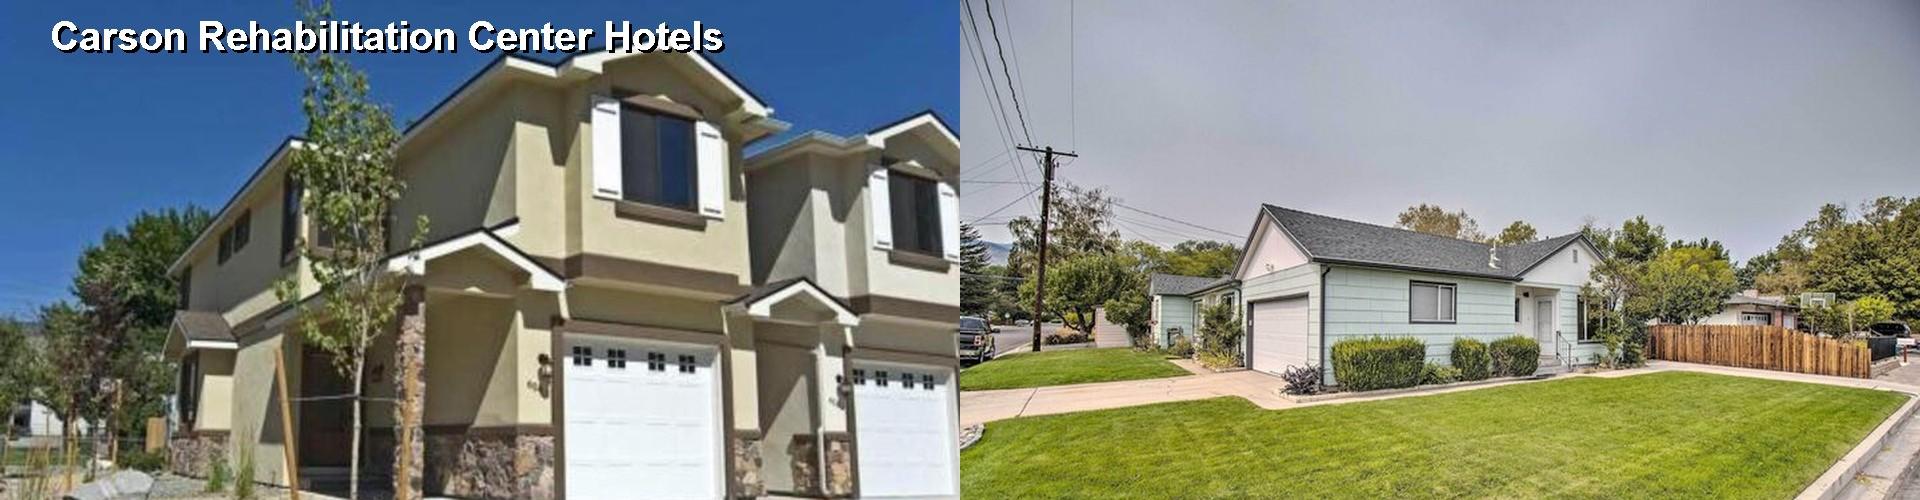 5 Best Hotels Near Carson Rehabilitation Center